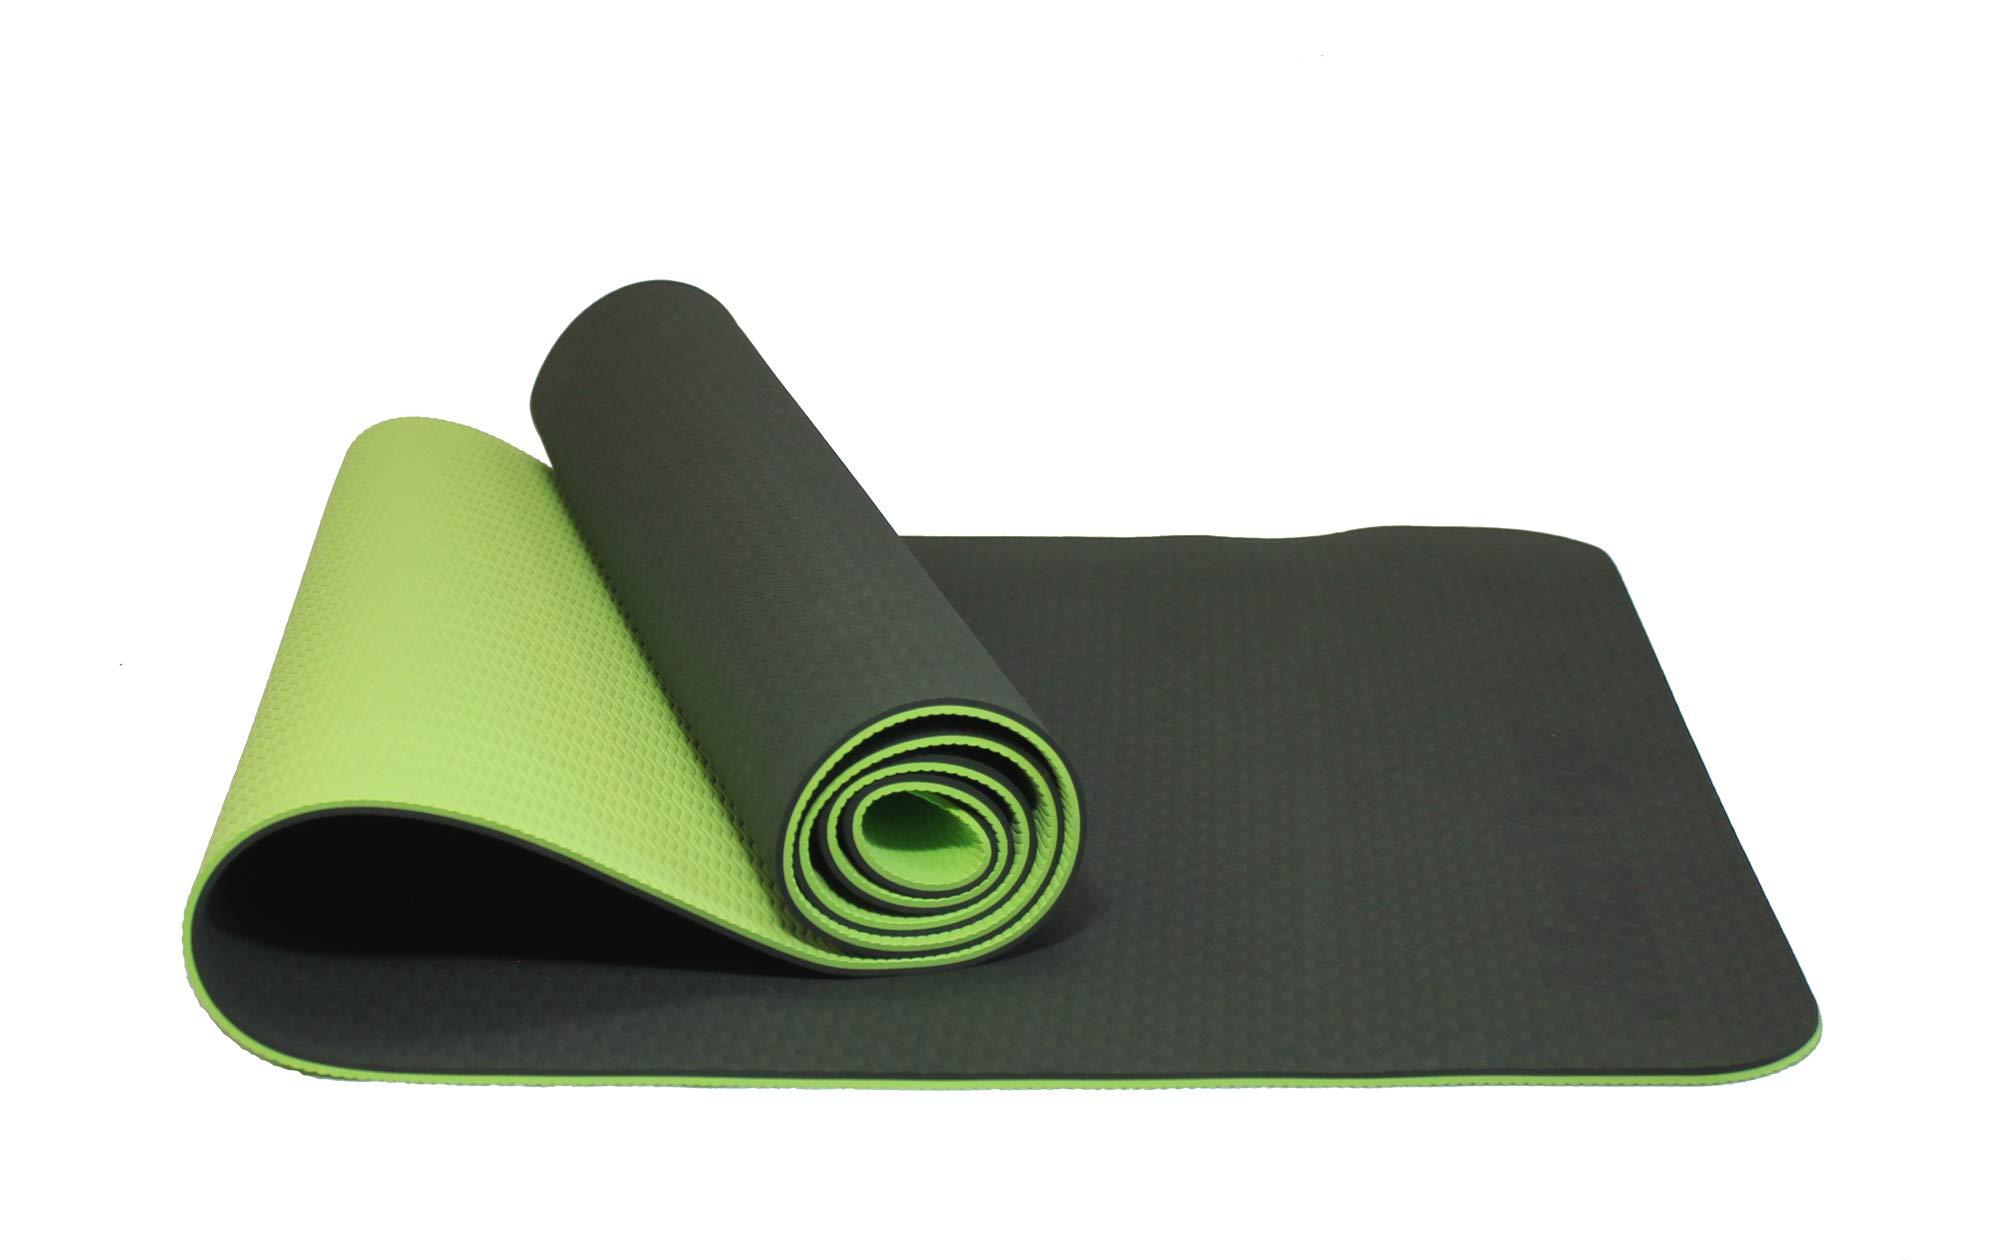 MAXYOGA® Esterilla para Yoga/Pilates/Gimnasia de Material ecológico TPE. Yoga Colchoneta Esterilla Antideslizante y Ligero con Grosor de 6mm, tamaño 183cm x 61cm. product image